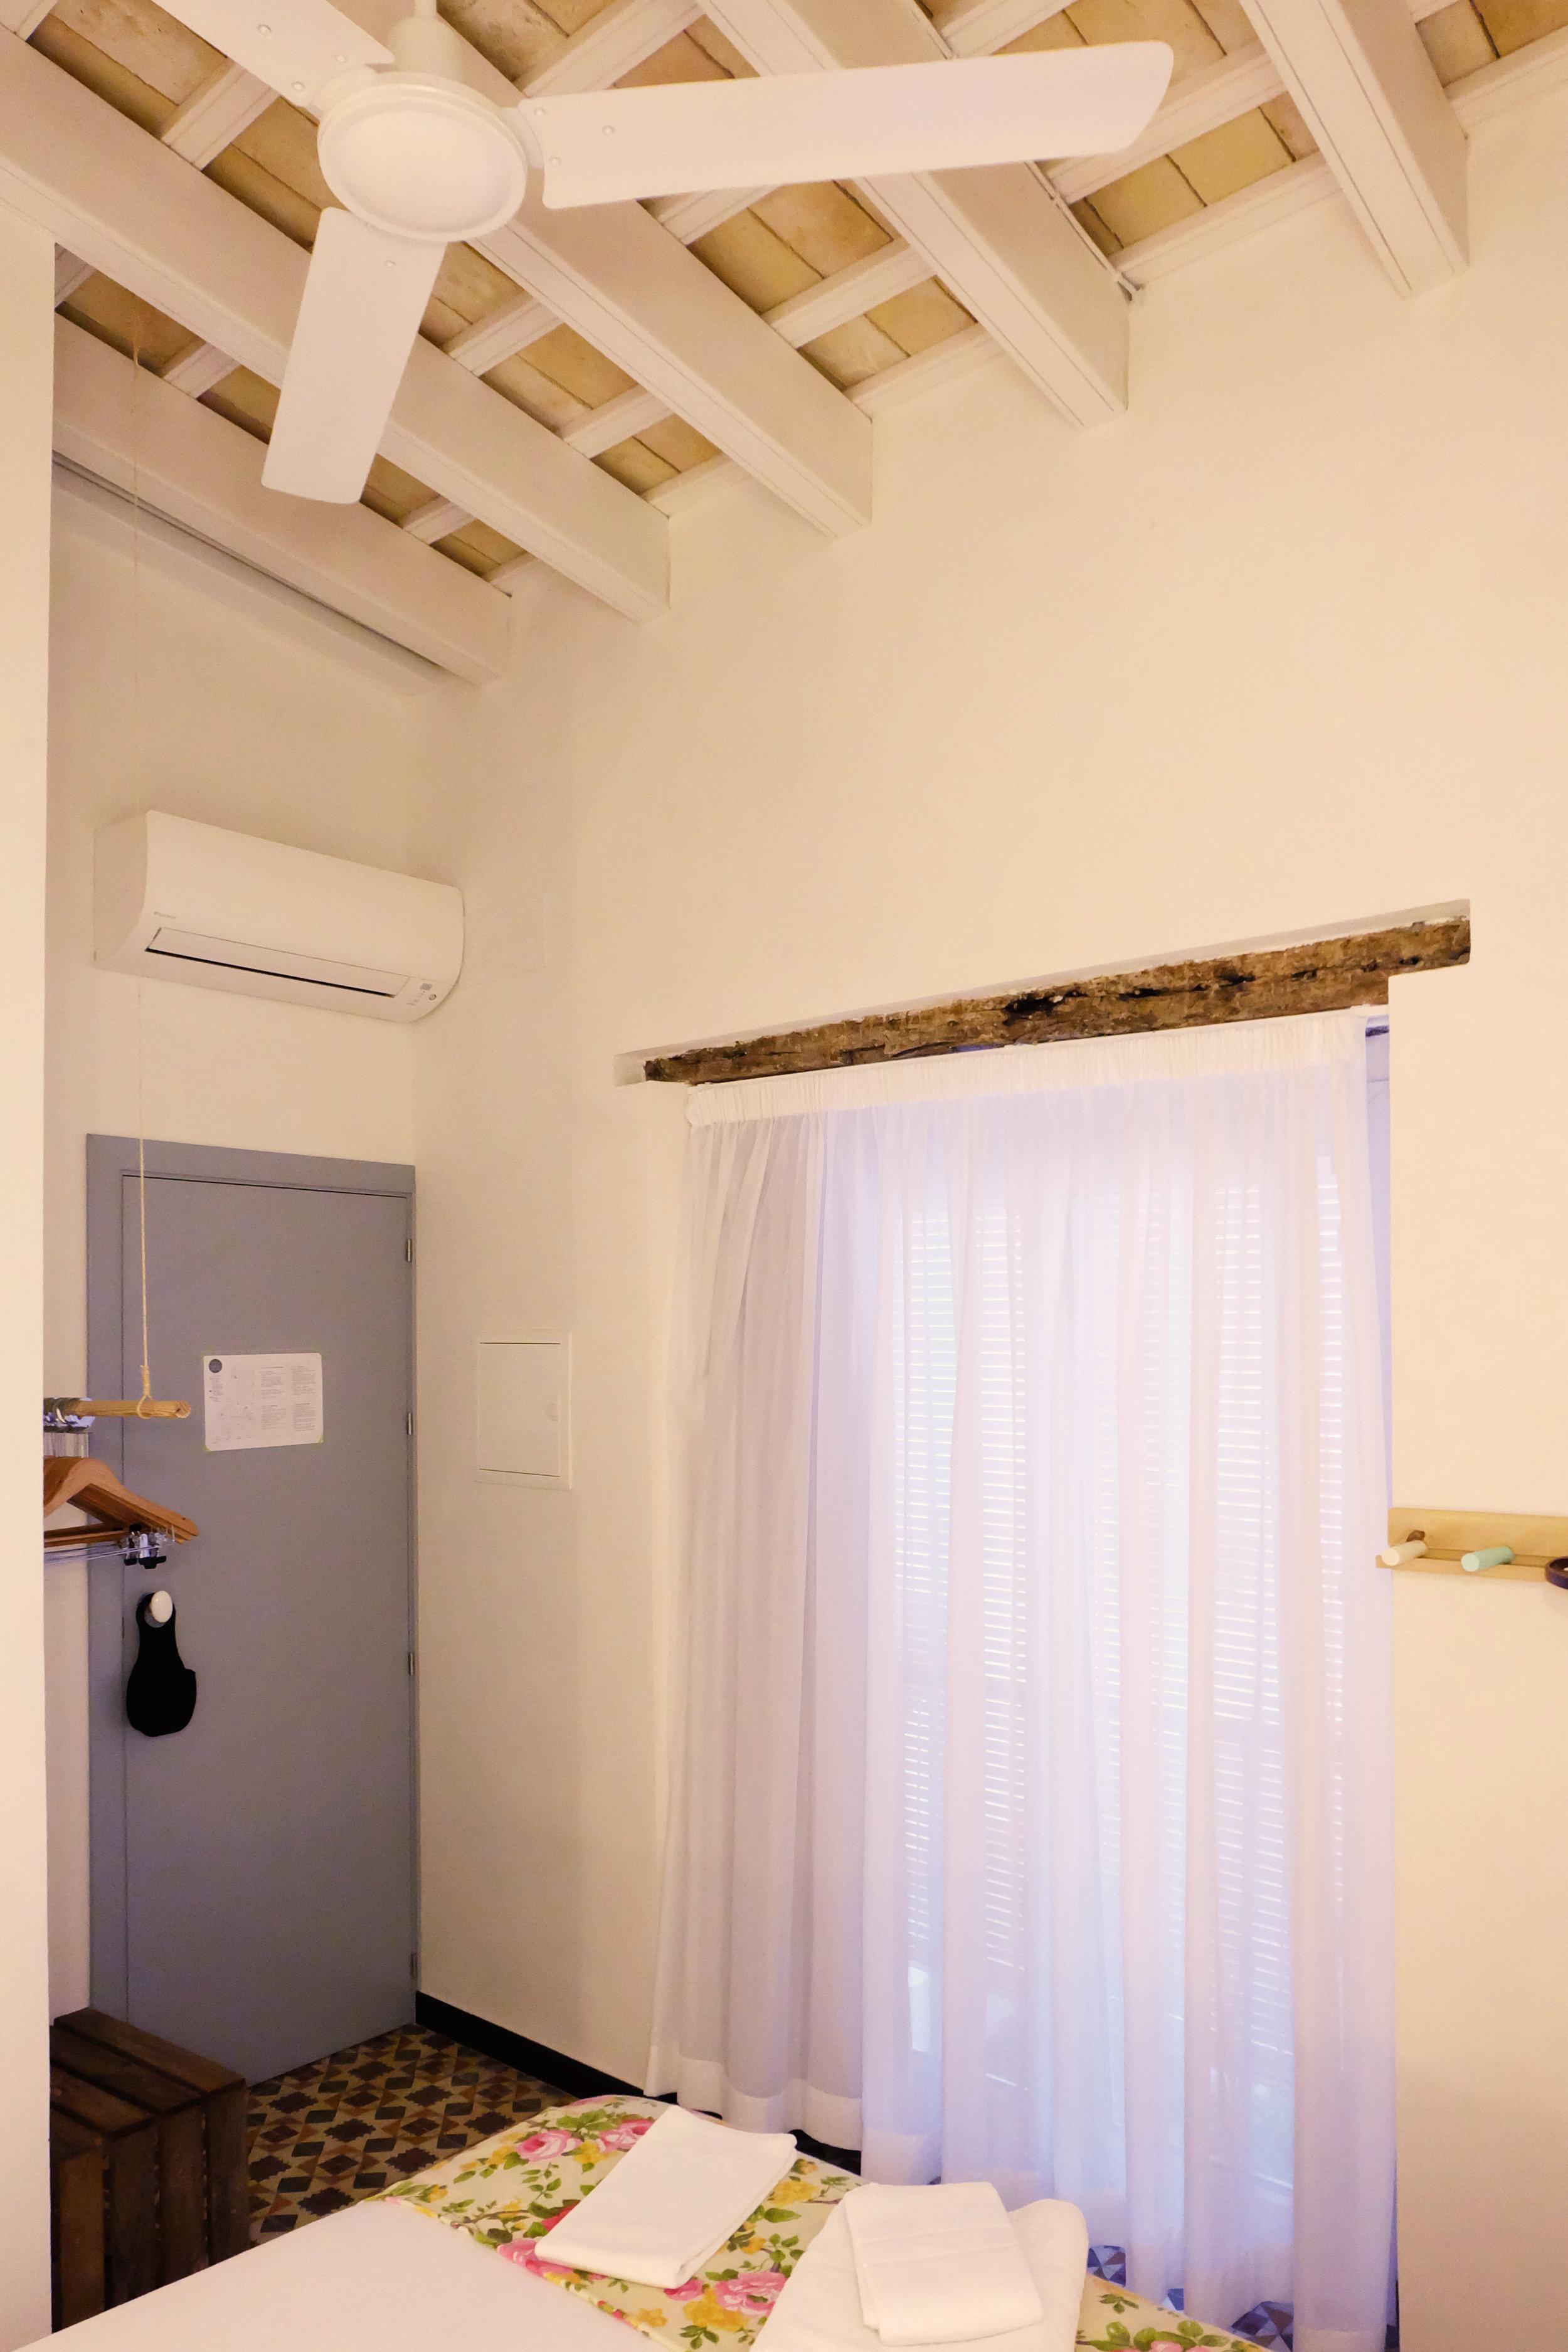 Hotel-Casa-de-Huespedes-Santa-Maria-Habitacion-10-6.jpg